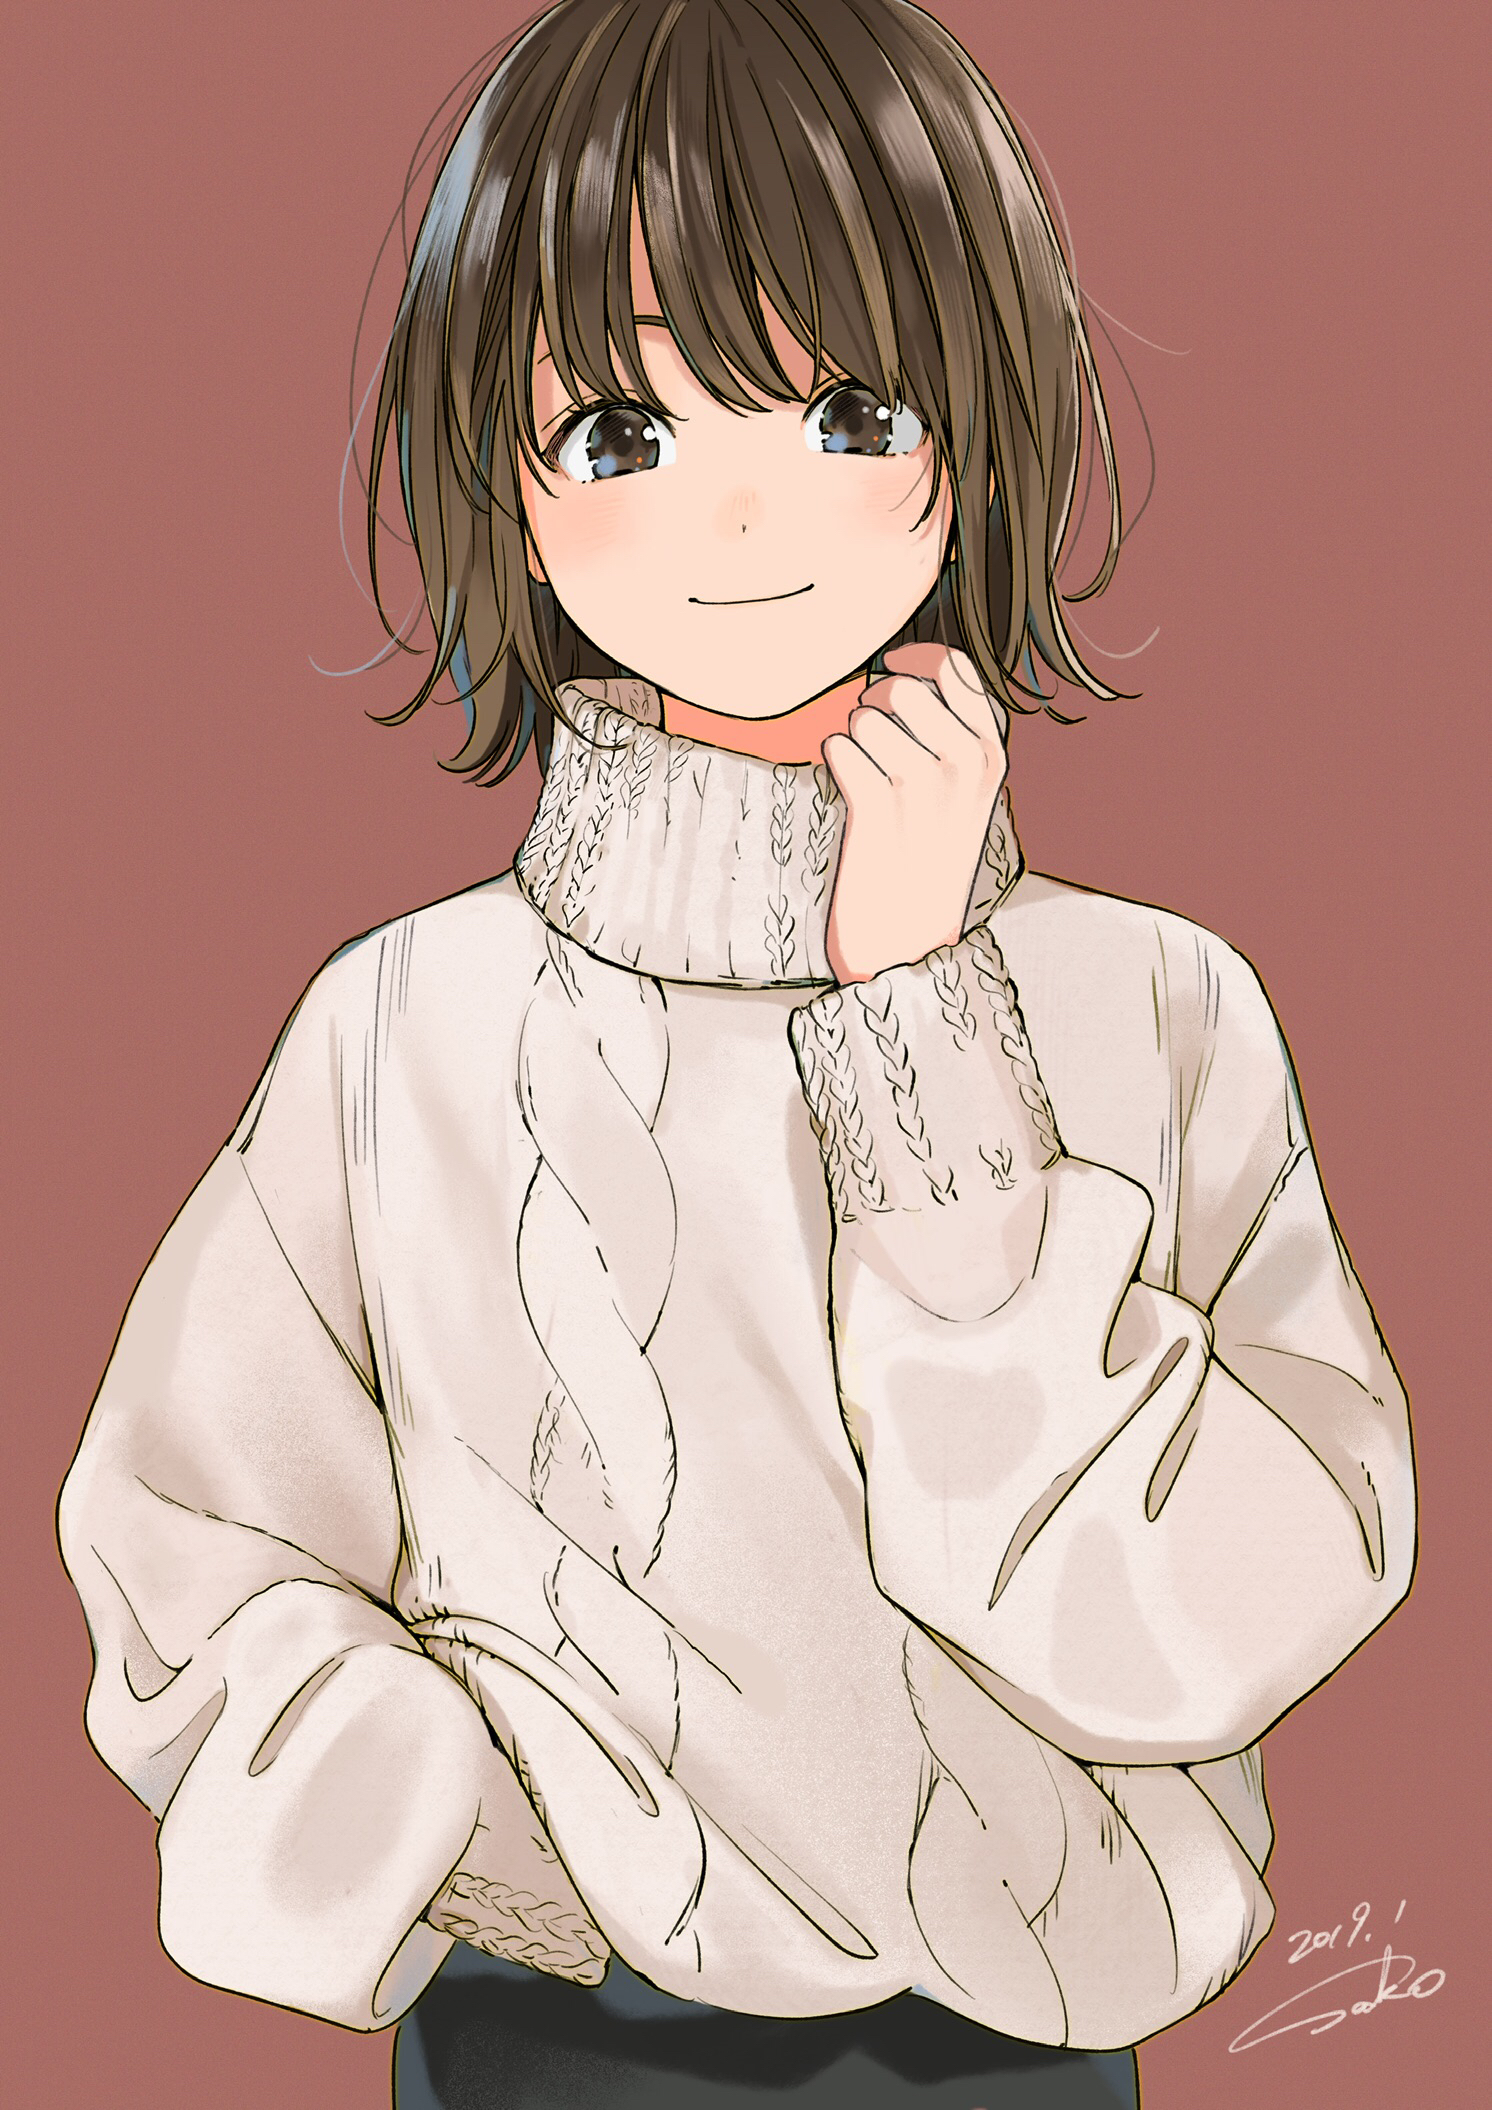 Sweater [Original]